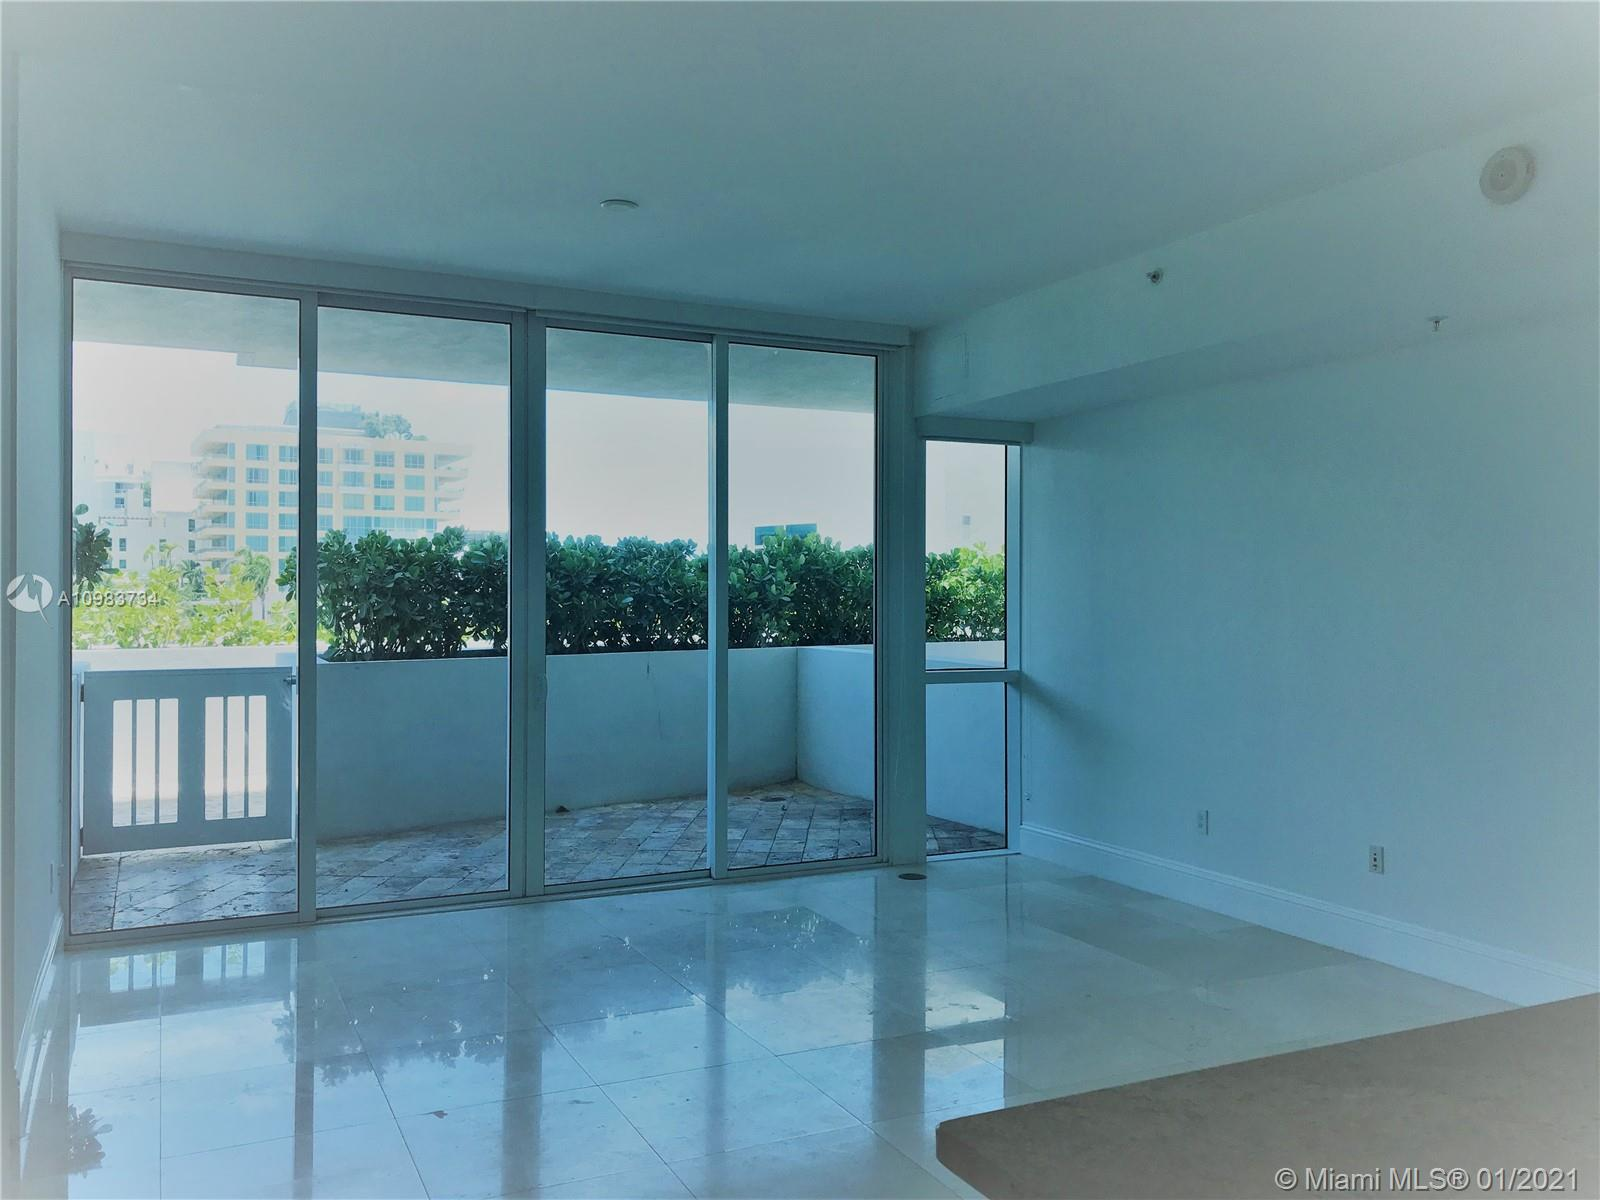 Continuum North #512 - 50 S Pointe Dr #512, Miami Beach, FL 33139